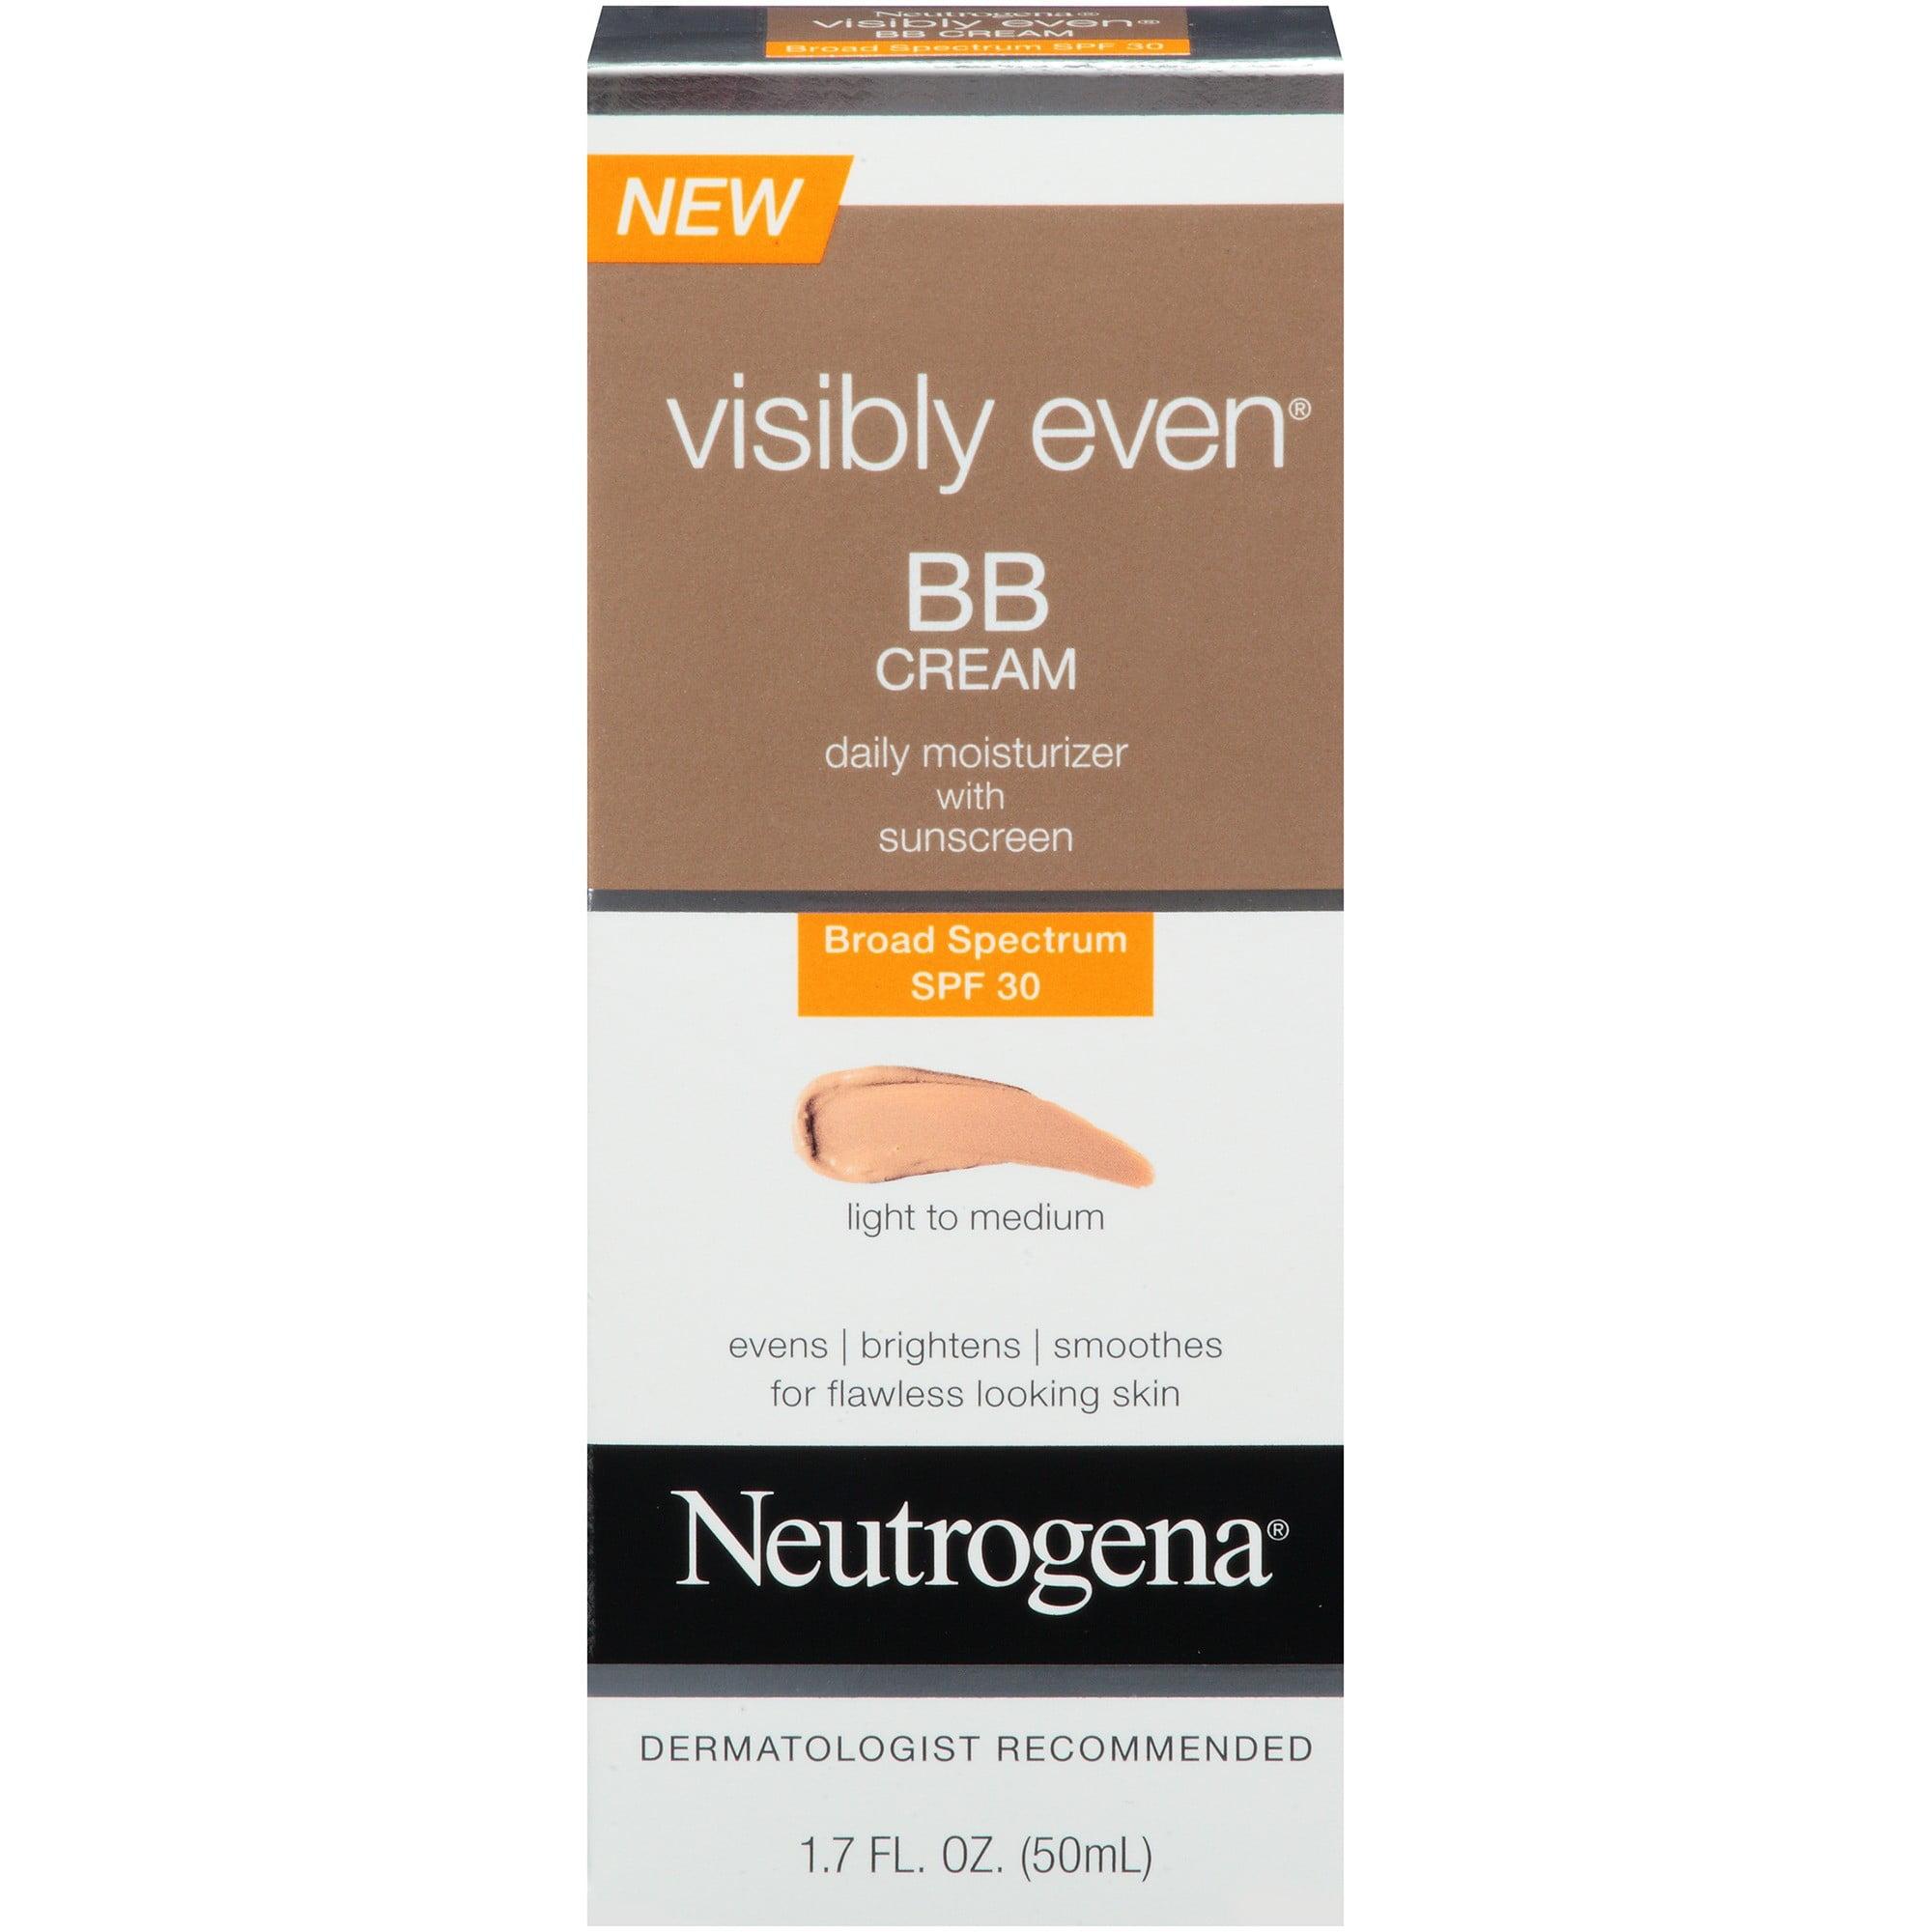 Neutrogena Visibly Even BB Cream Daily Moisturizer with SPF 30, Light/Medium, 1.7 Fl Oz